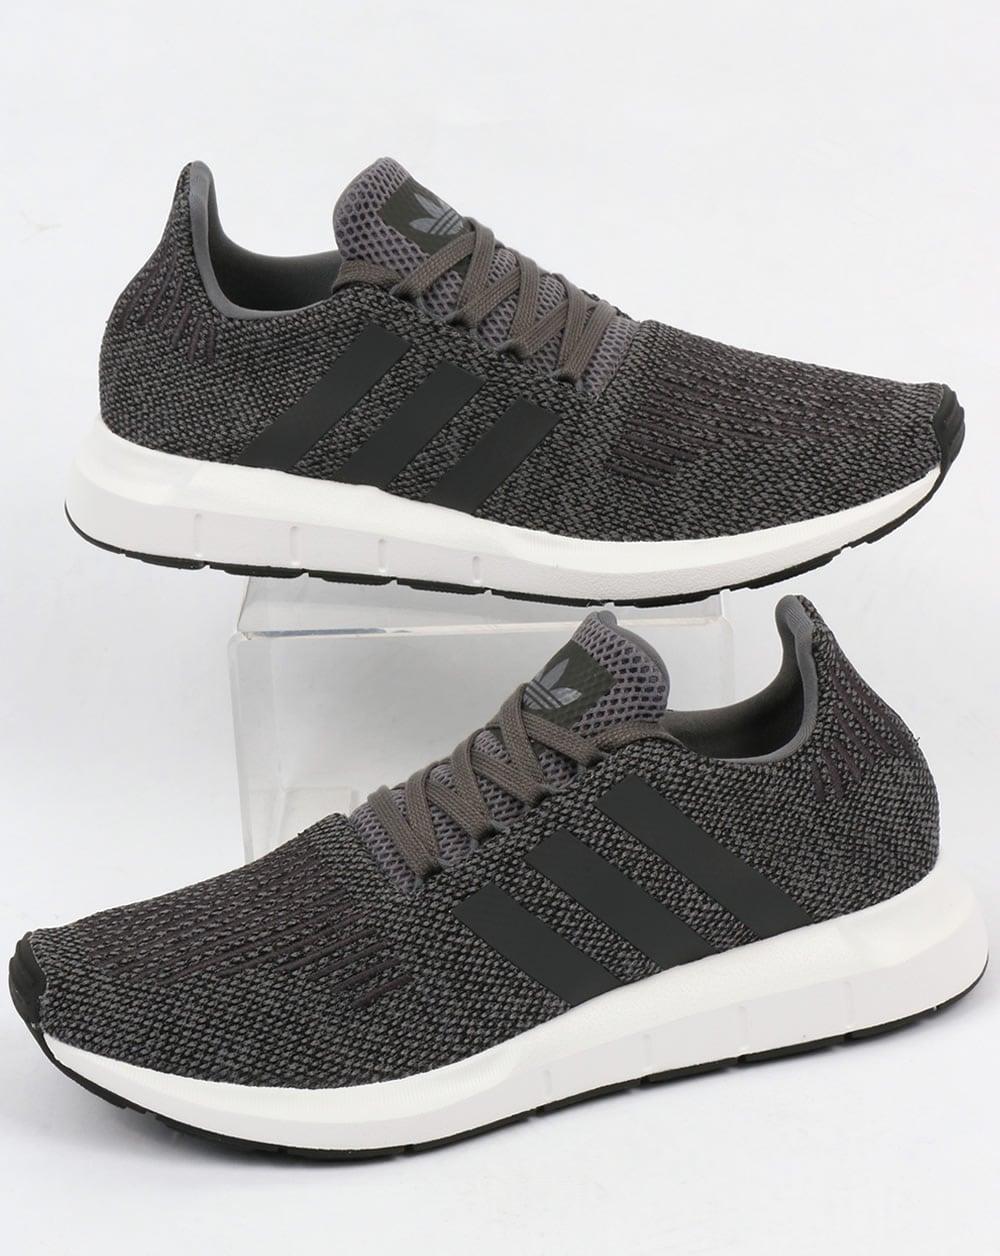 fb9215b7f4590 adidas Trainers Adidas Swift Run Trainers Grey Black